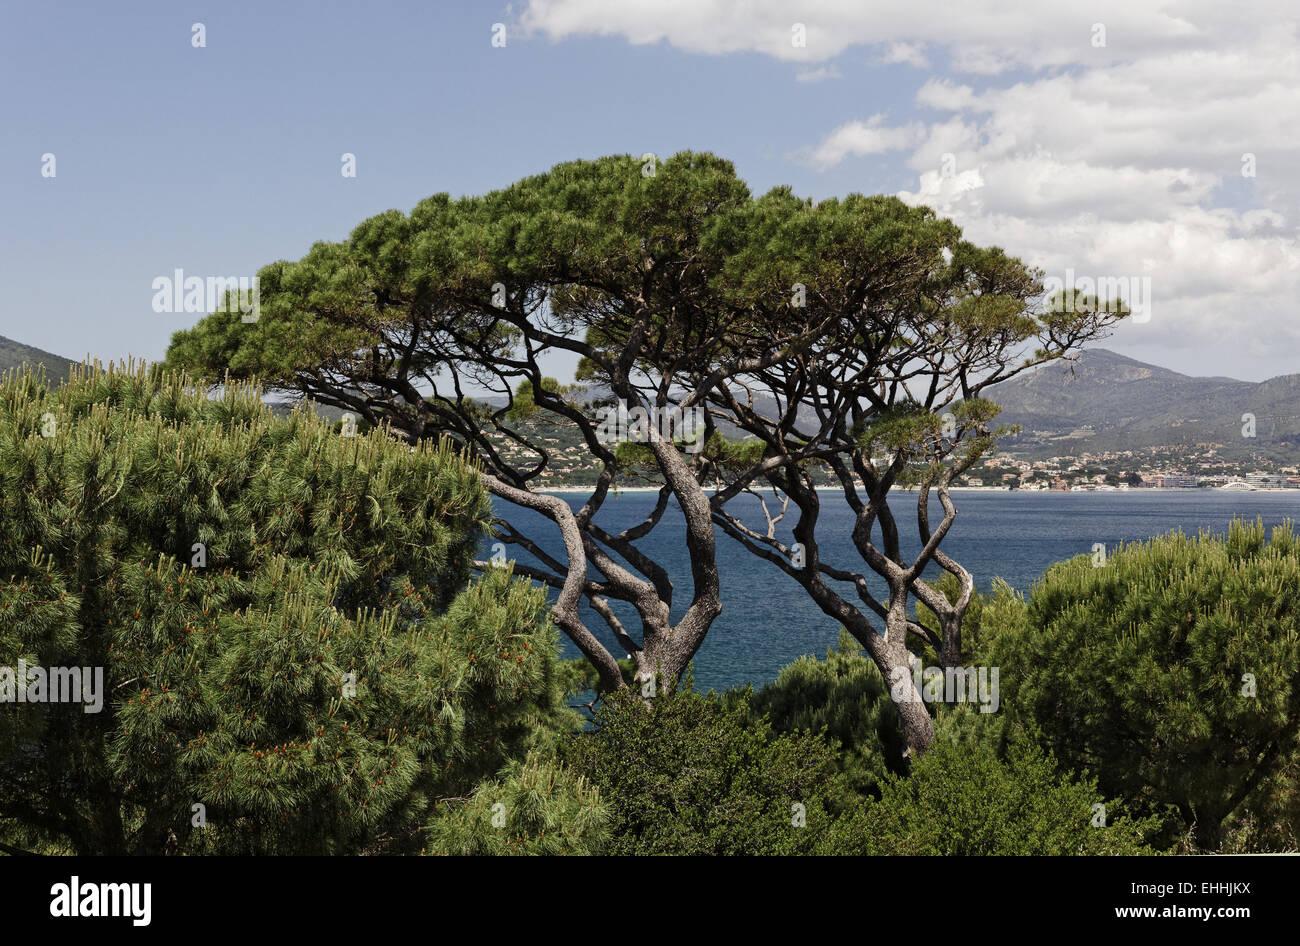 Pinus halepensis, Aleppo Pine in Saint-Tropez - Stock Image